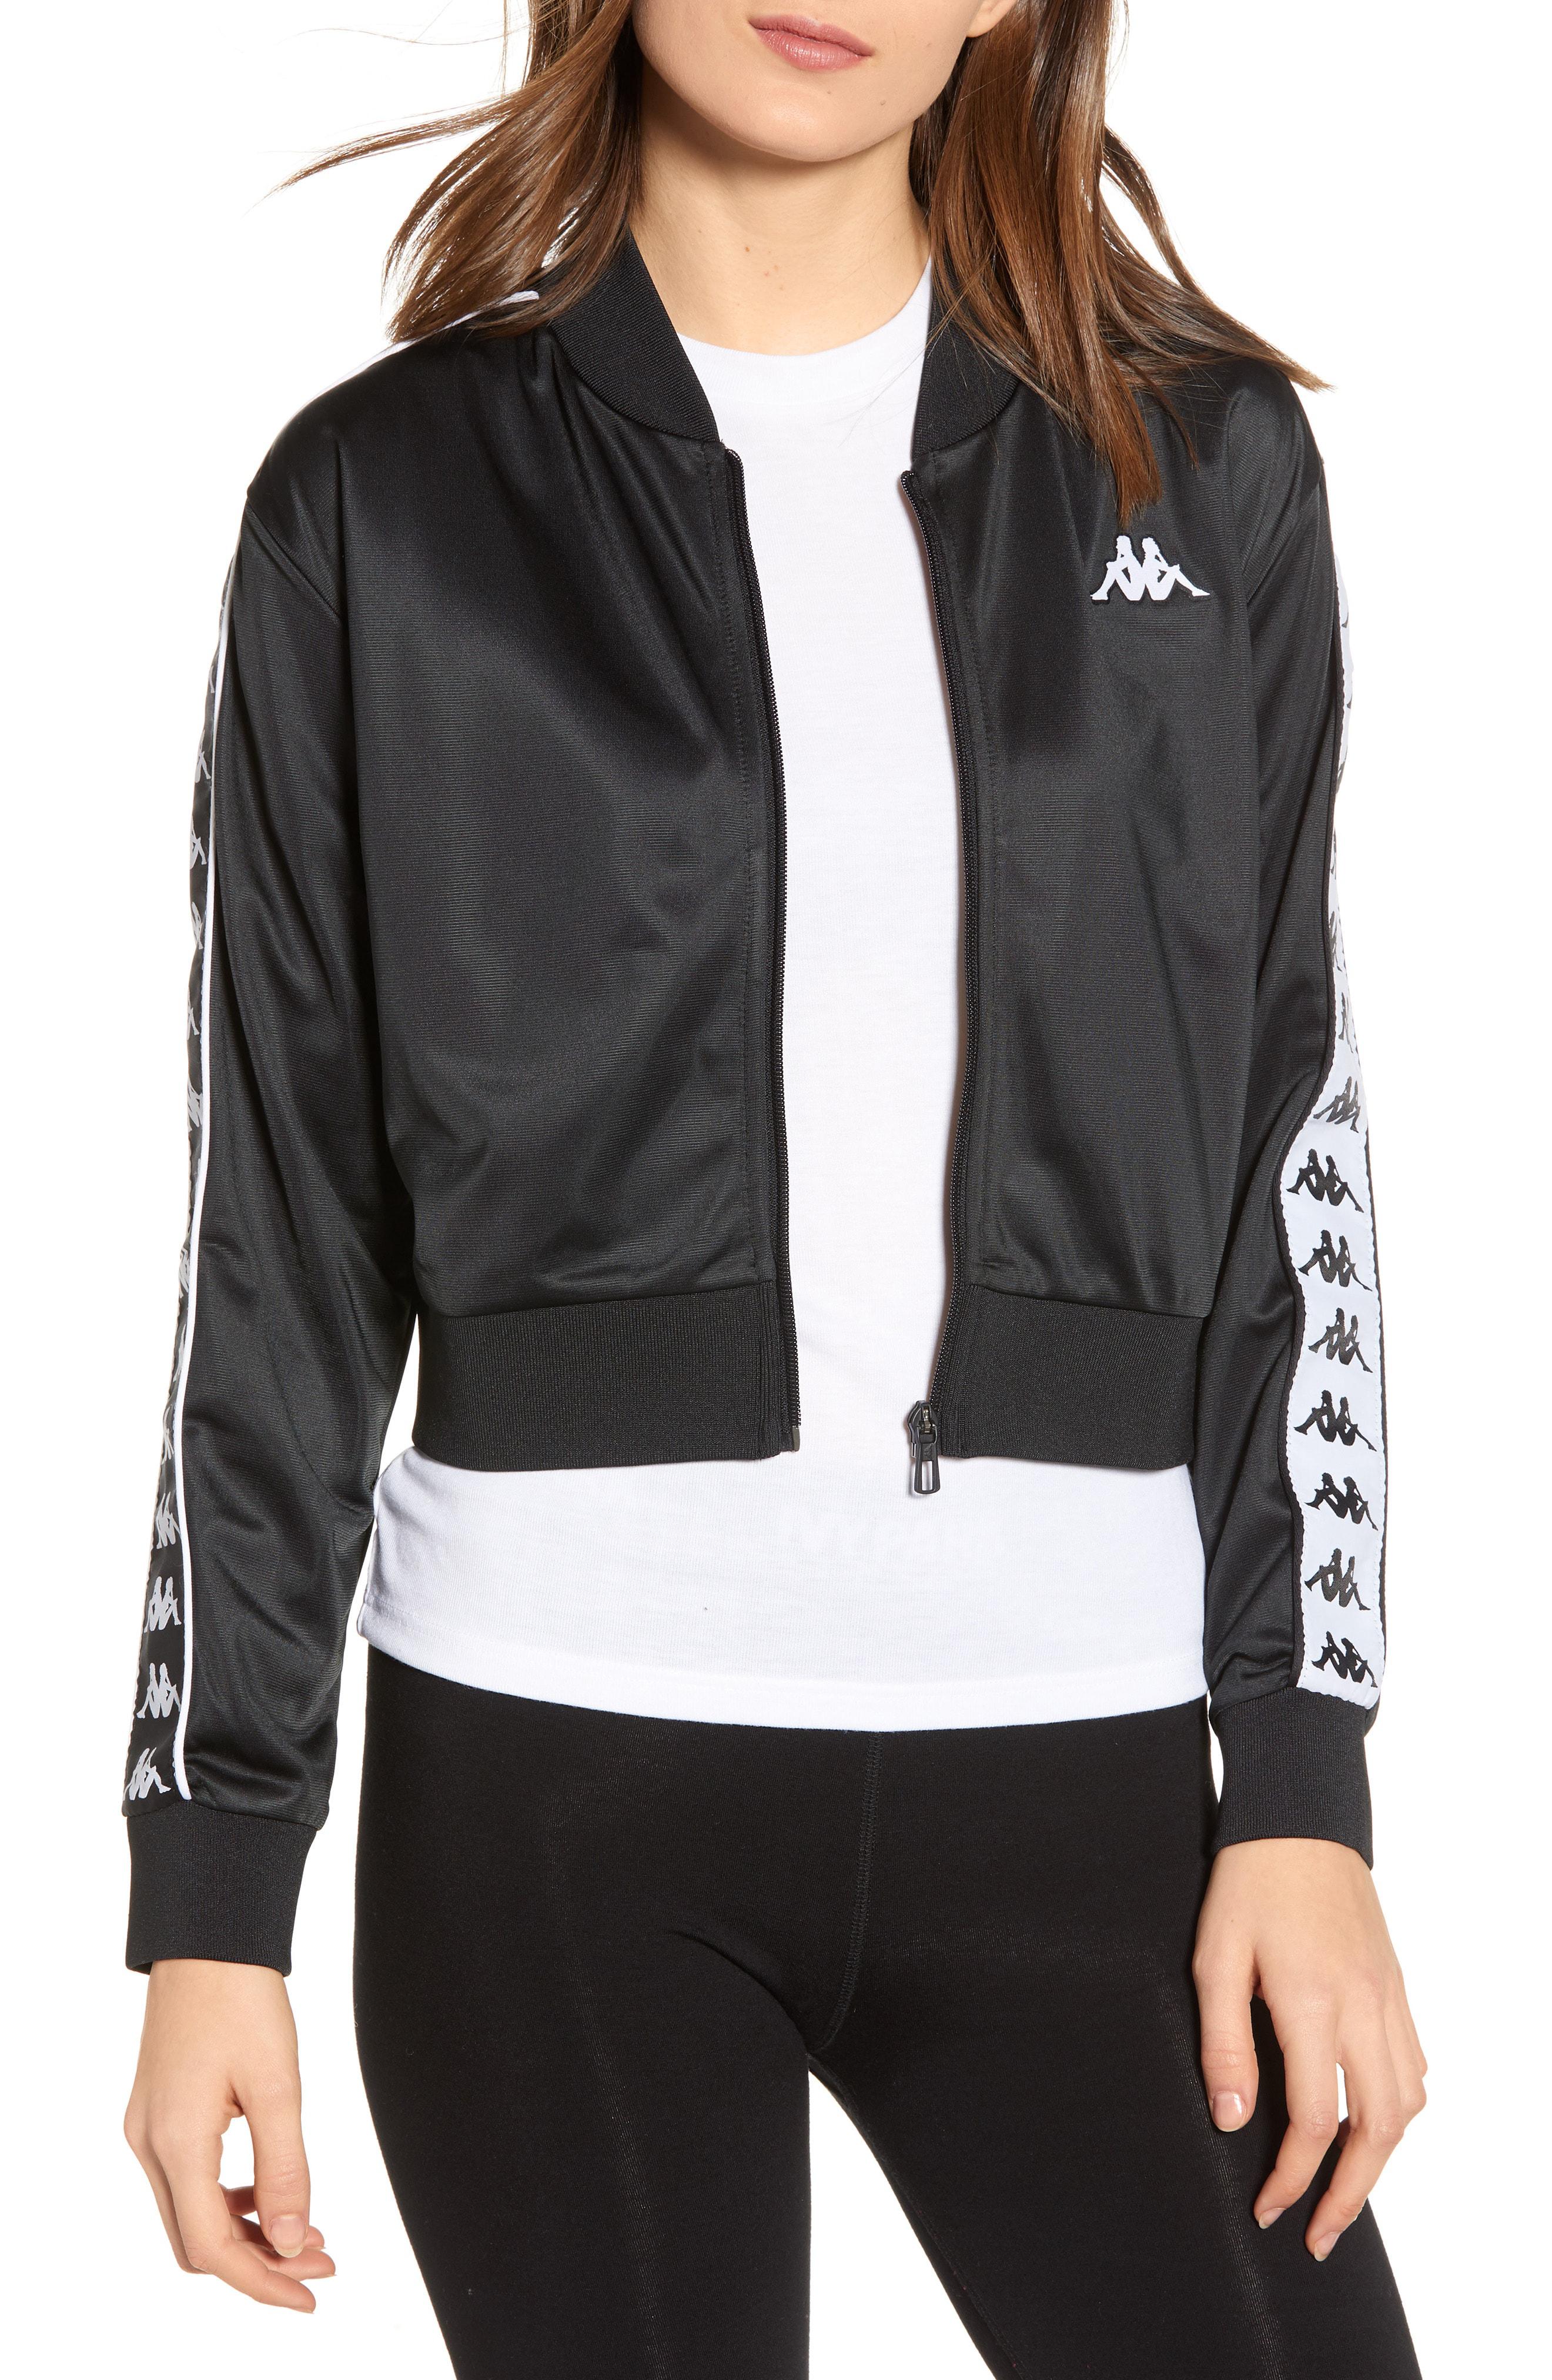 487ec55a 222 Banda Asber Crop Track Jacket in Black/ White 943